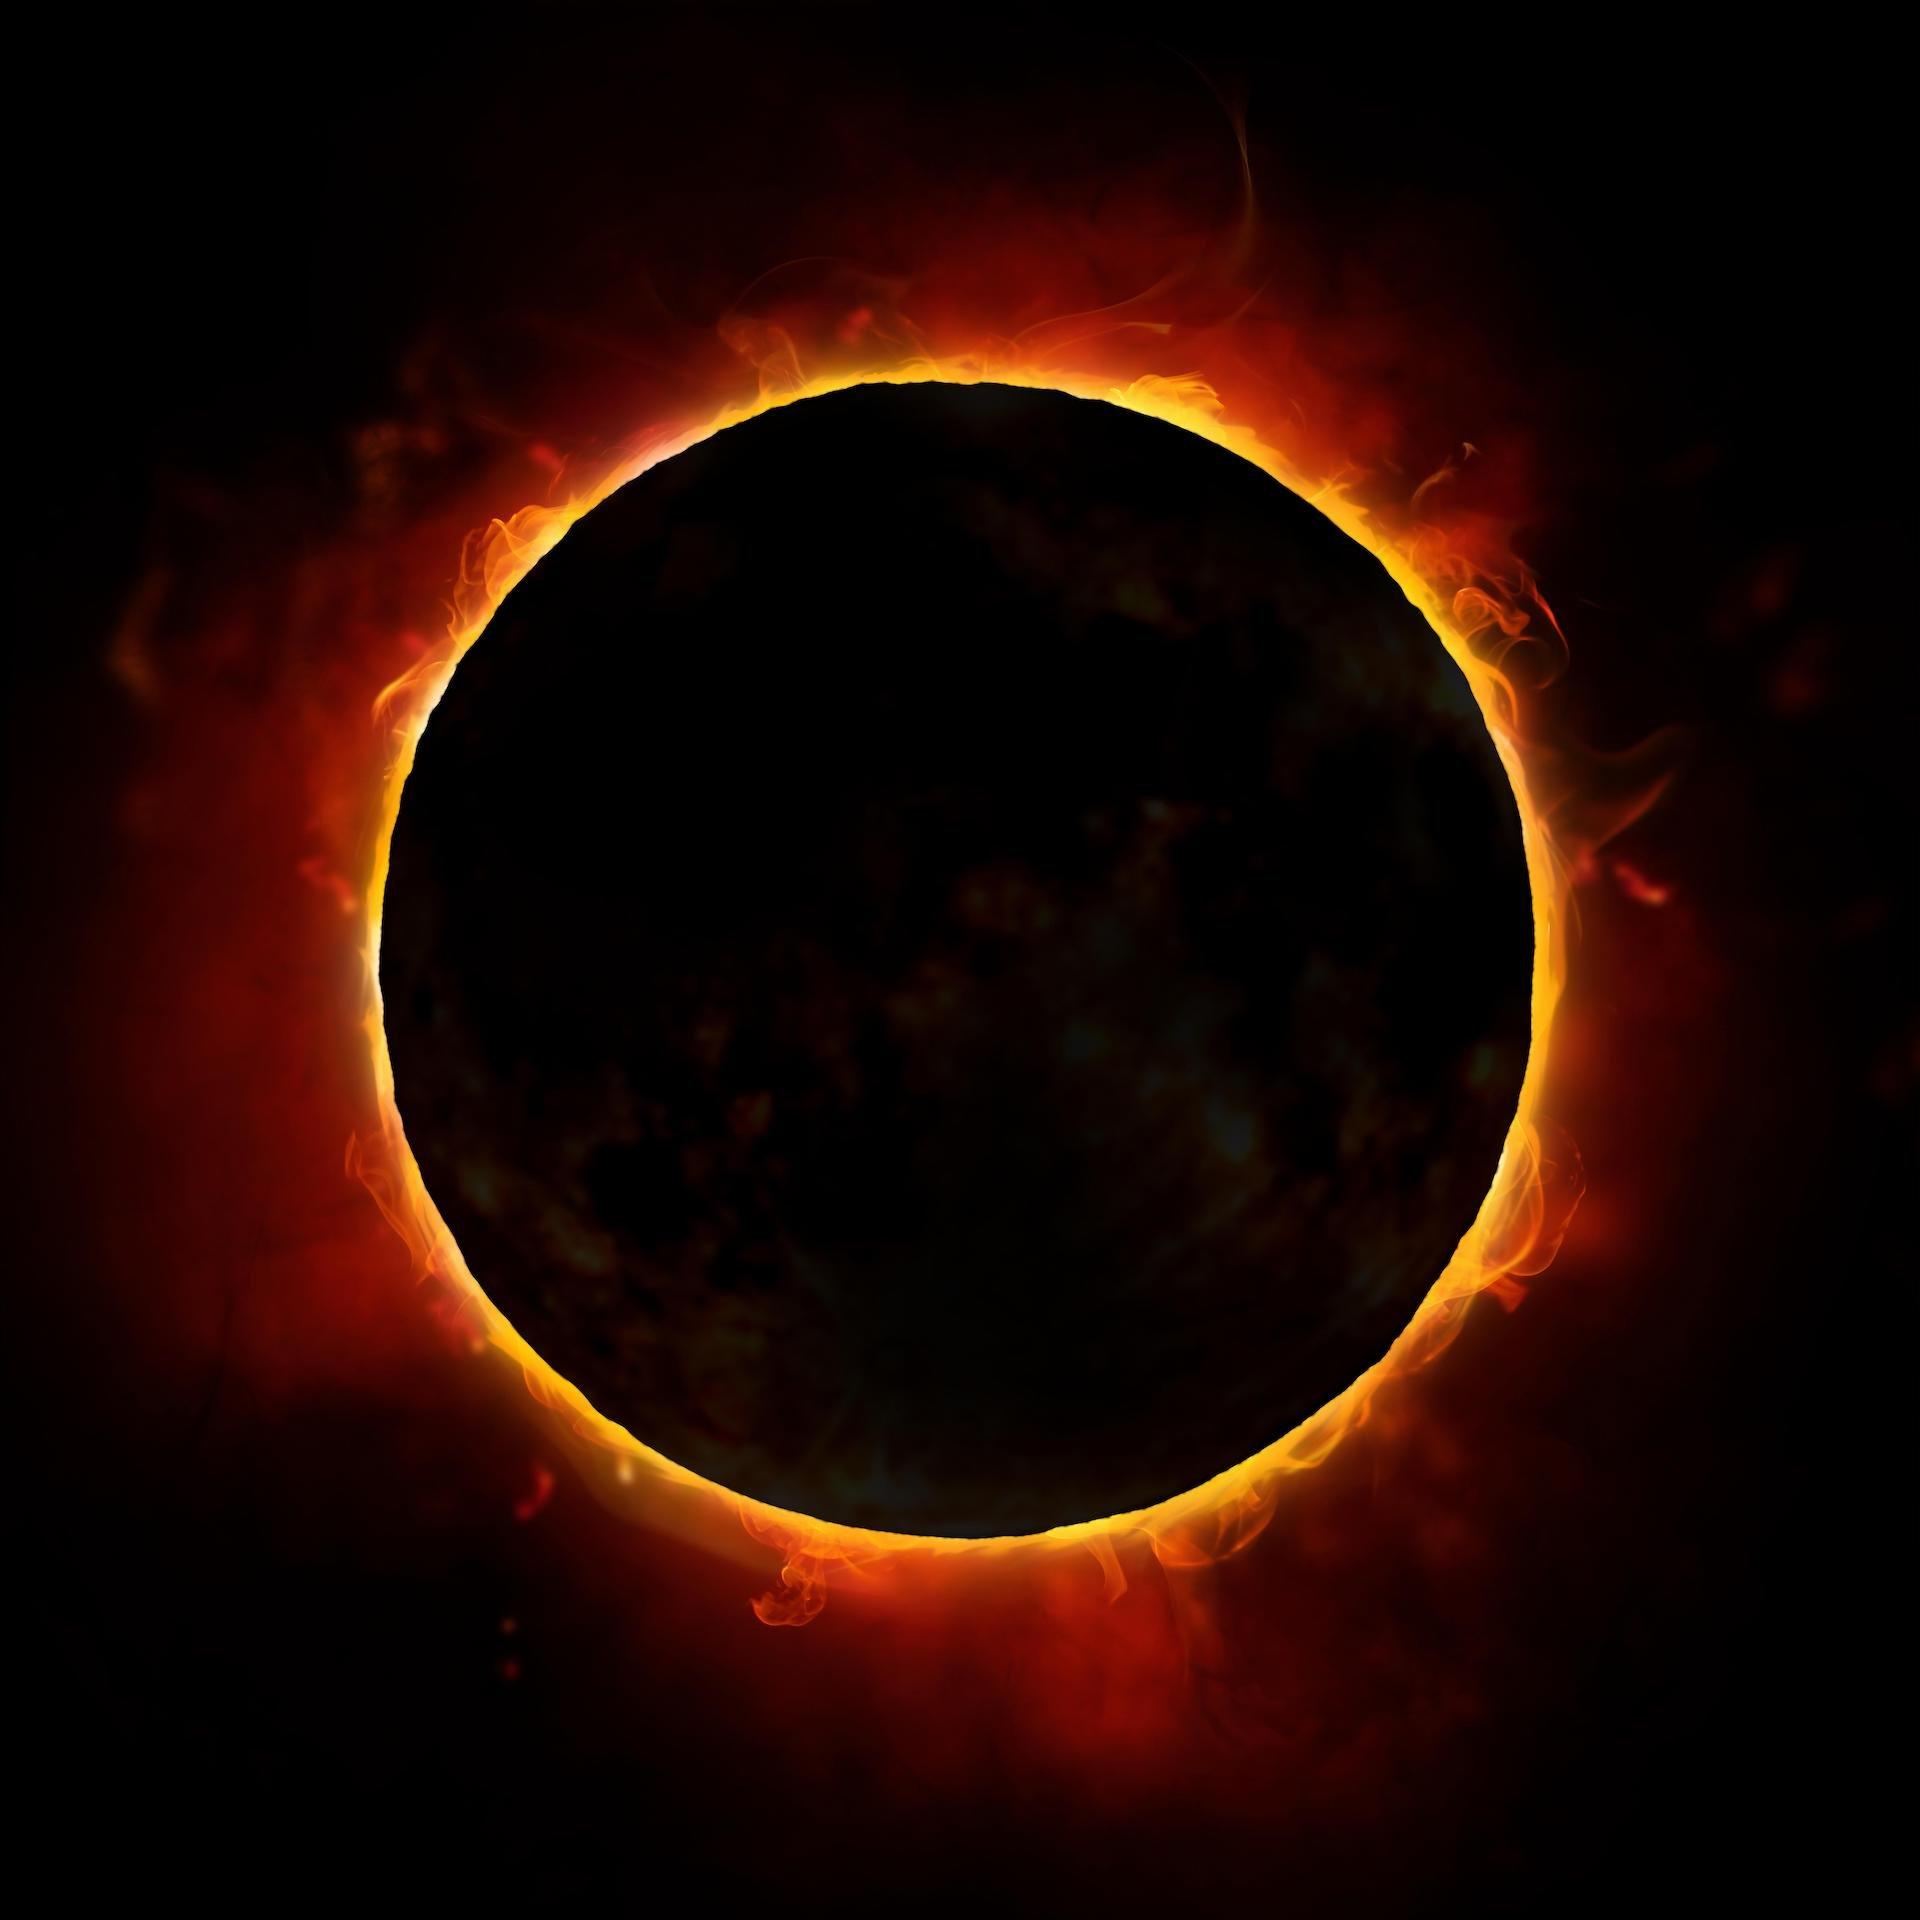 Eclipse anular de Sol 2020: transmisión en vivo